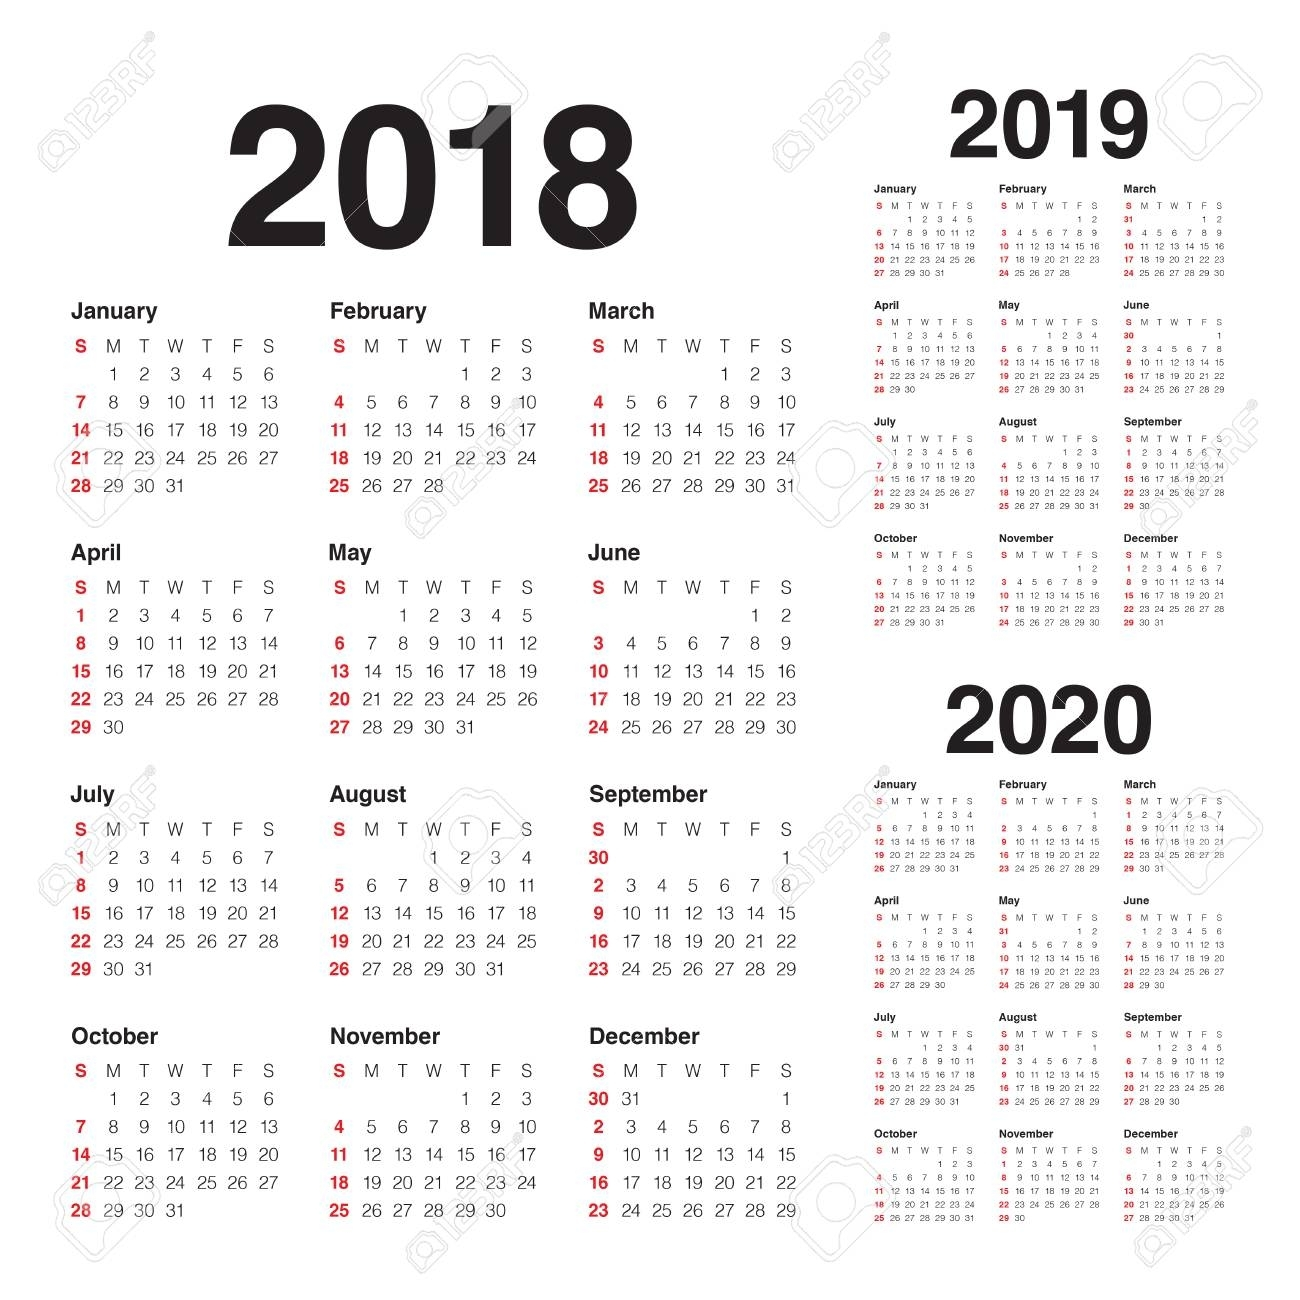 Year 2018 2019 2020 Calendar Vector Design Template, Simple And inside Edit Free Calendar Template 2019-2020